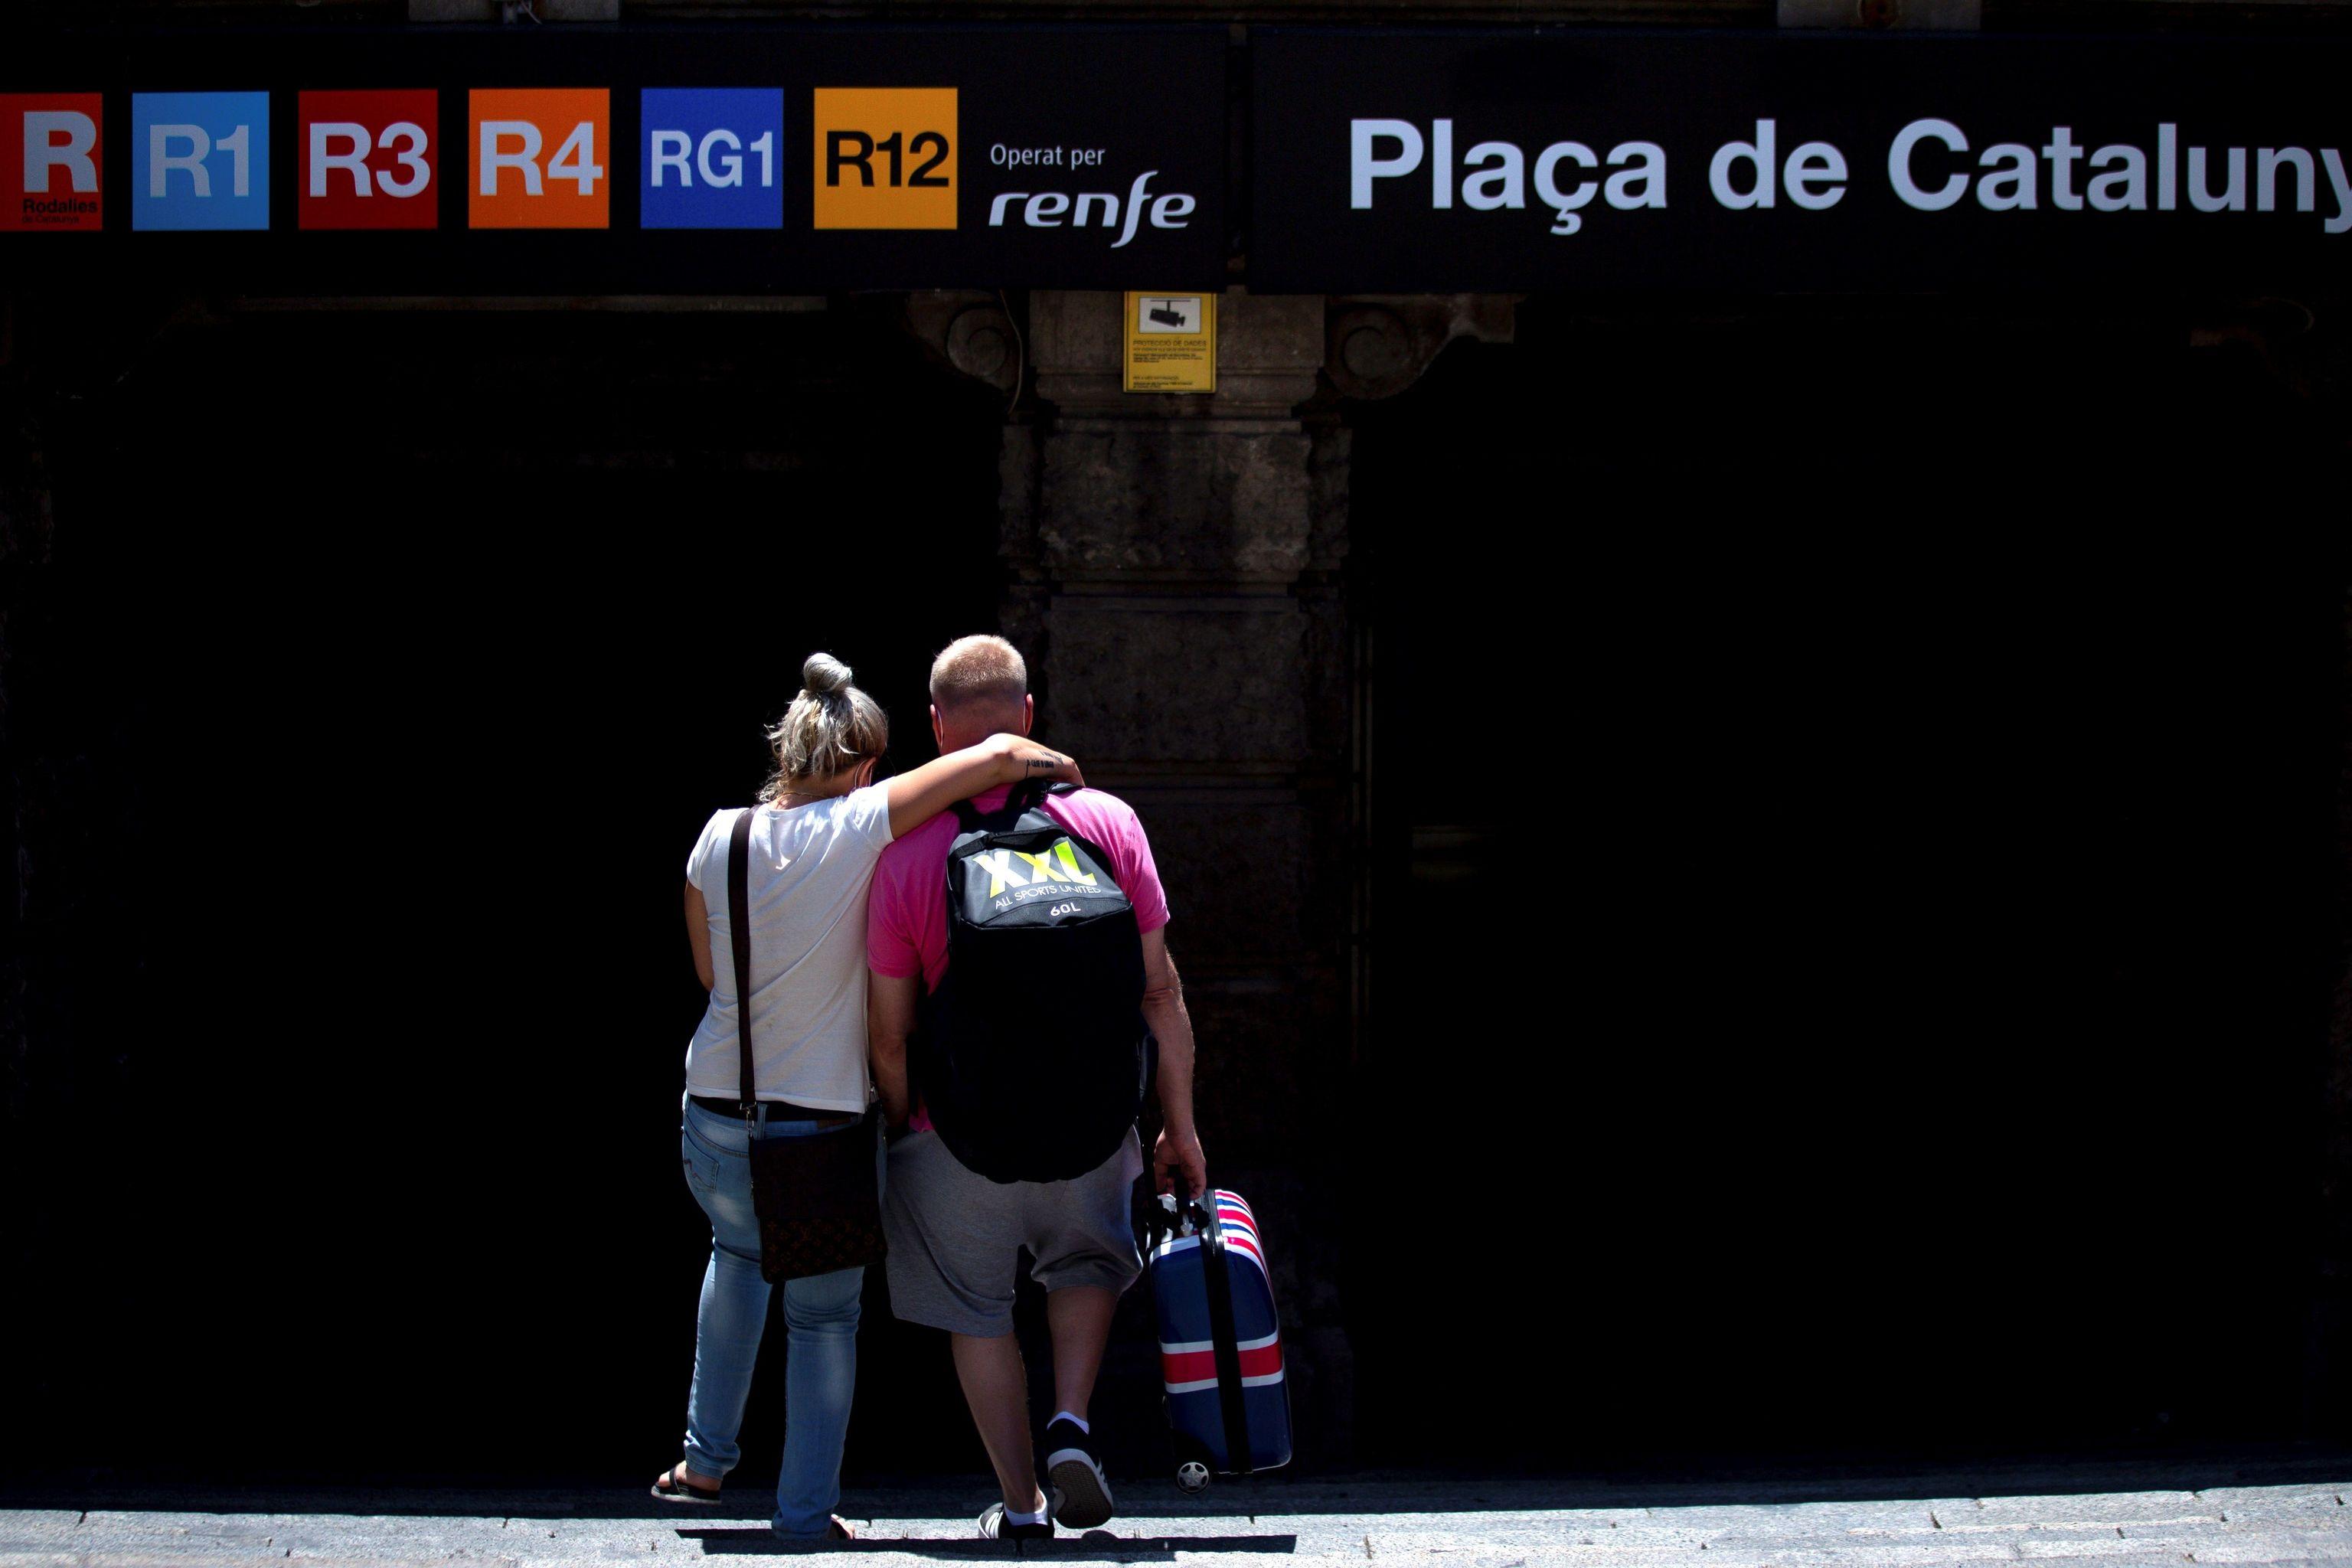 Llegada de turistas a Barcelona durante la pandemia de coronavirus.